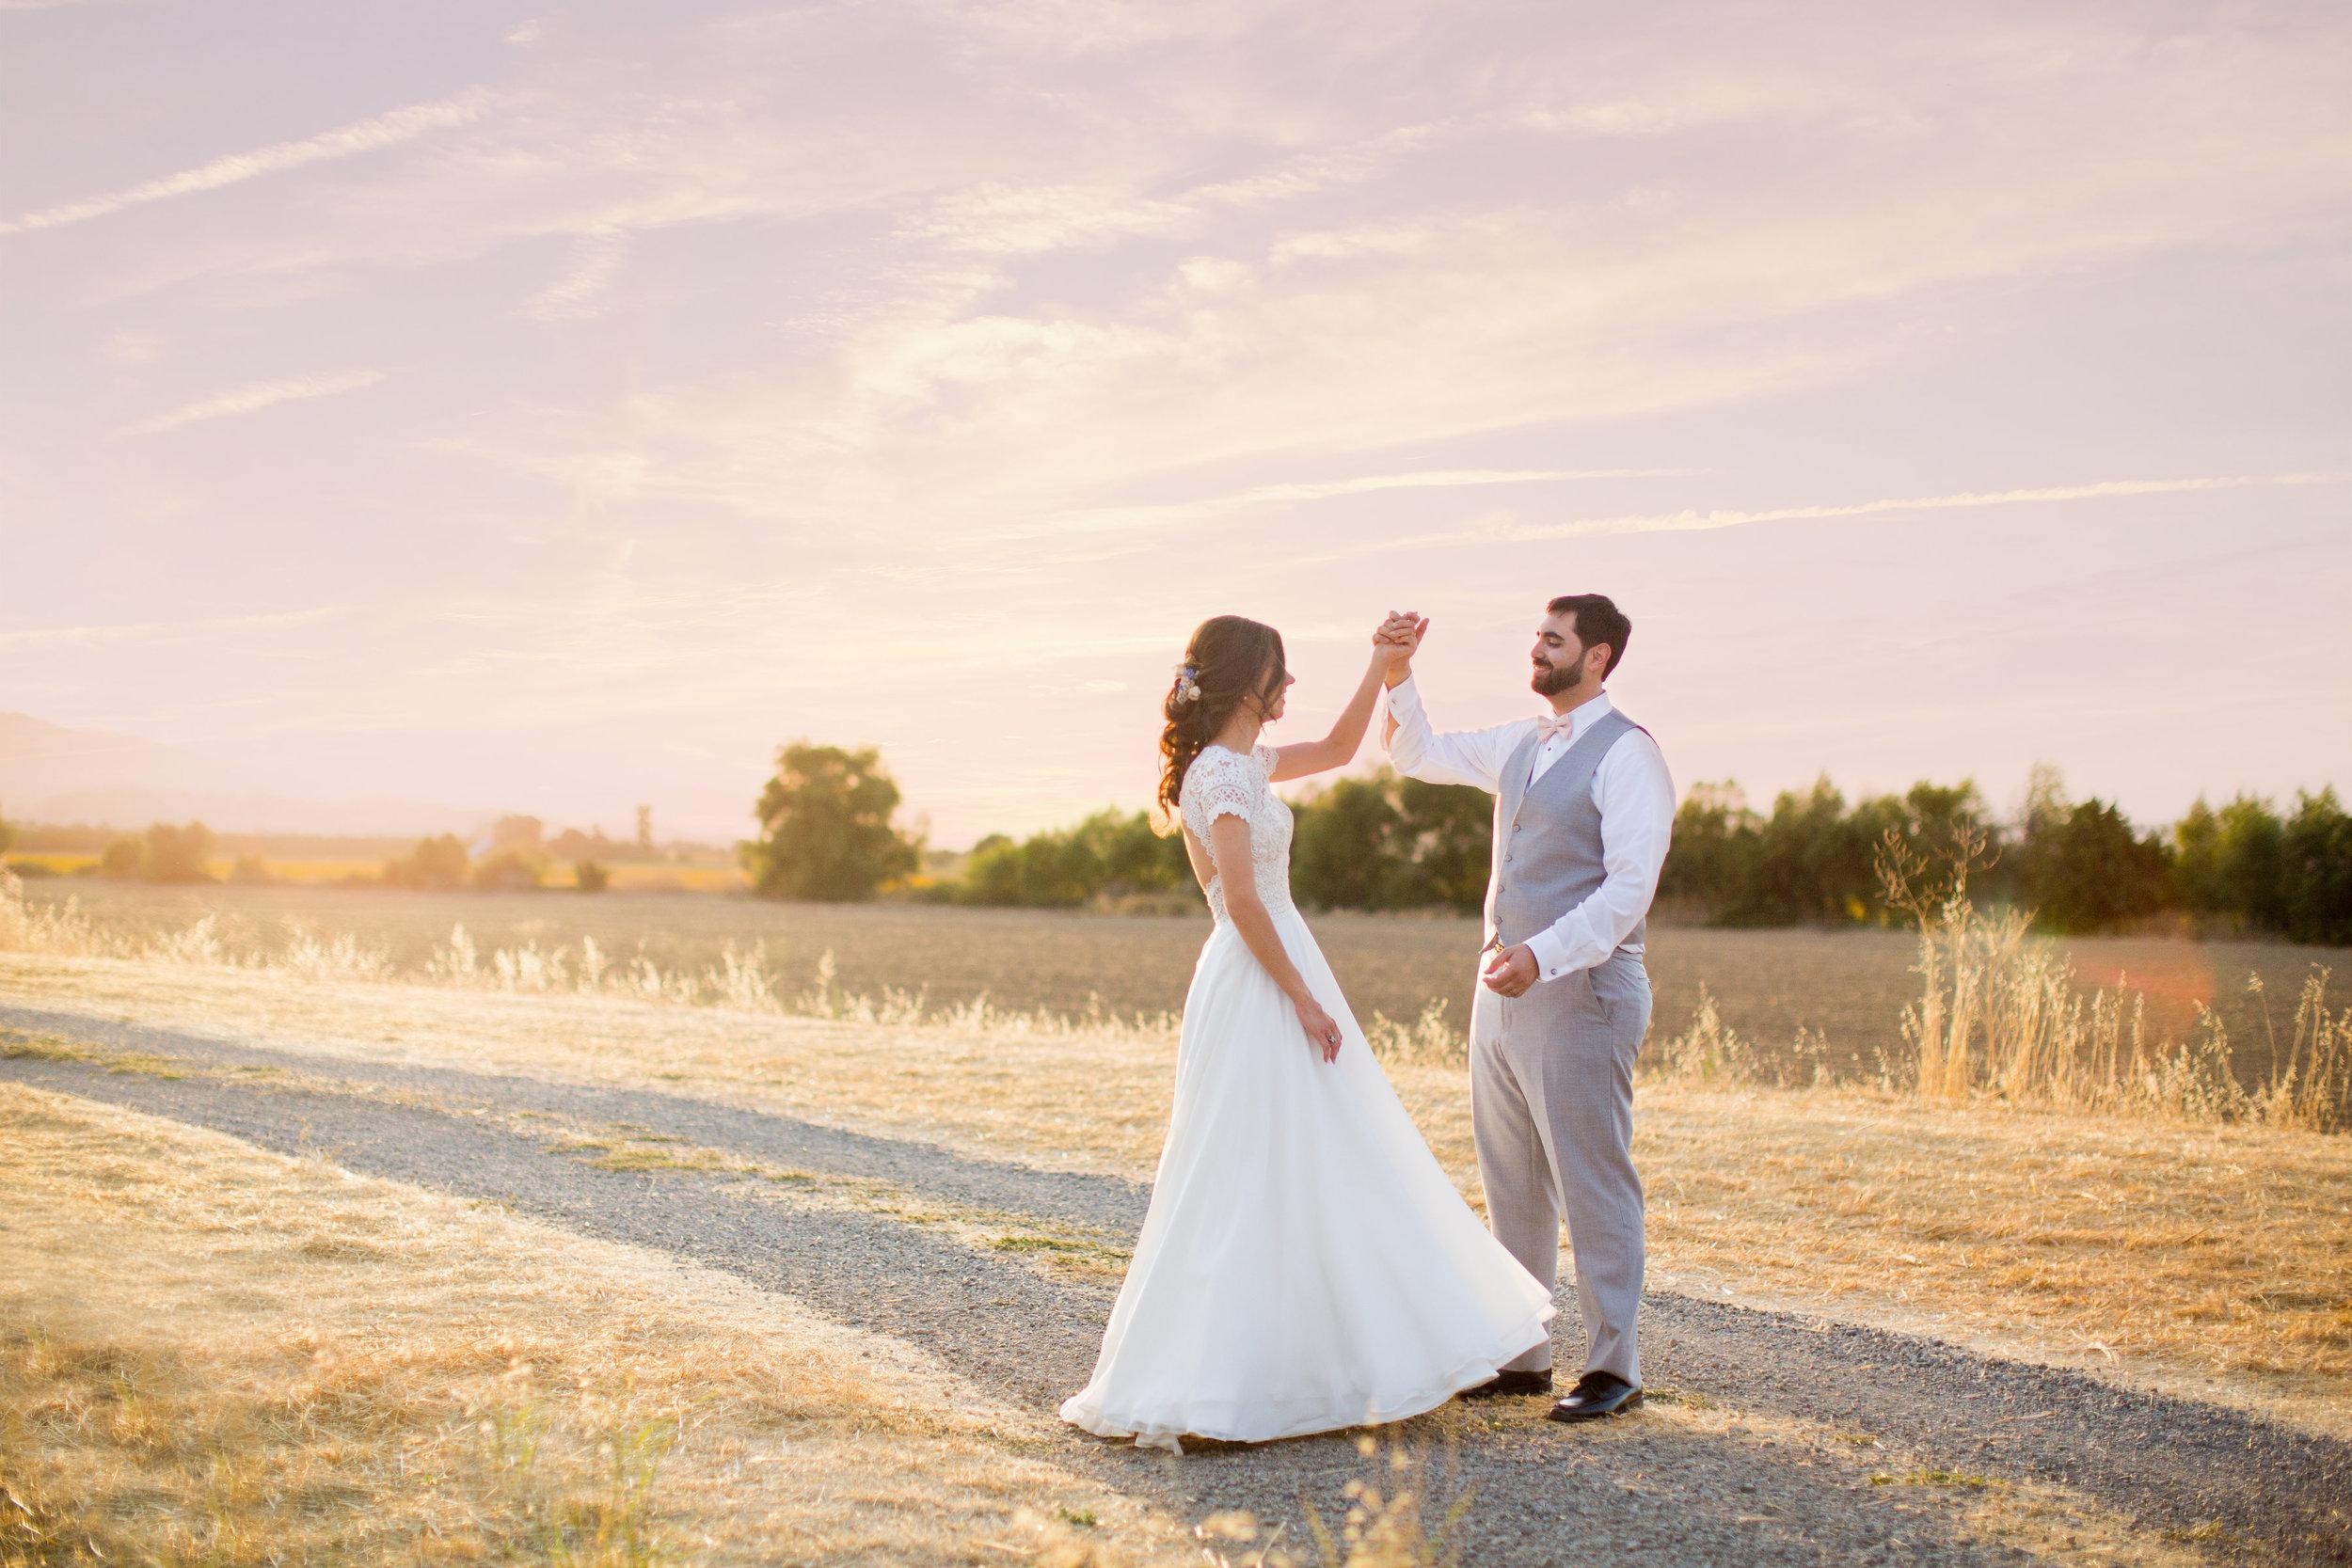 Park_Winters_sunset_bride.jpg